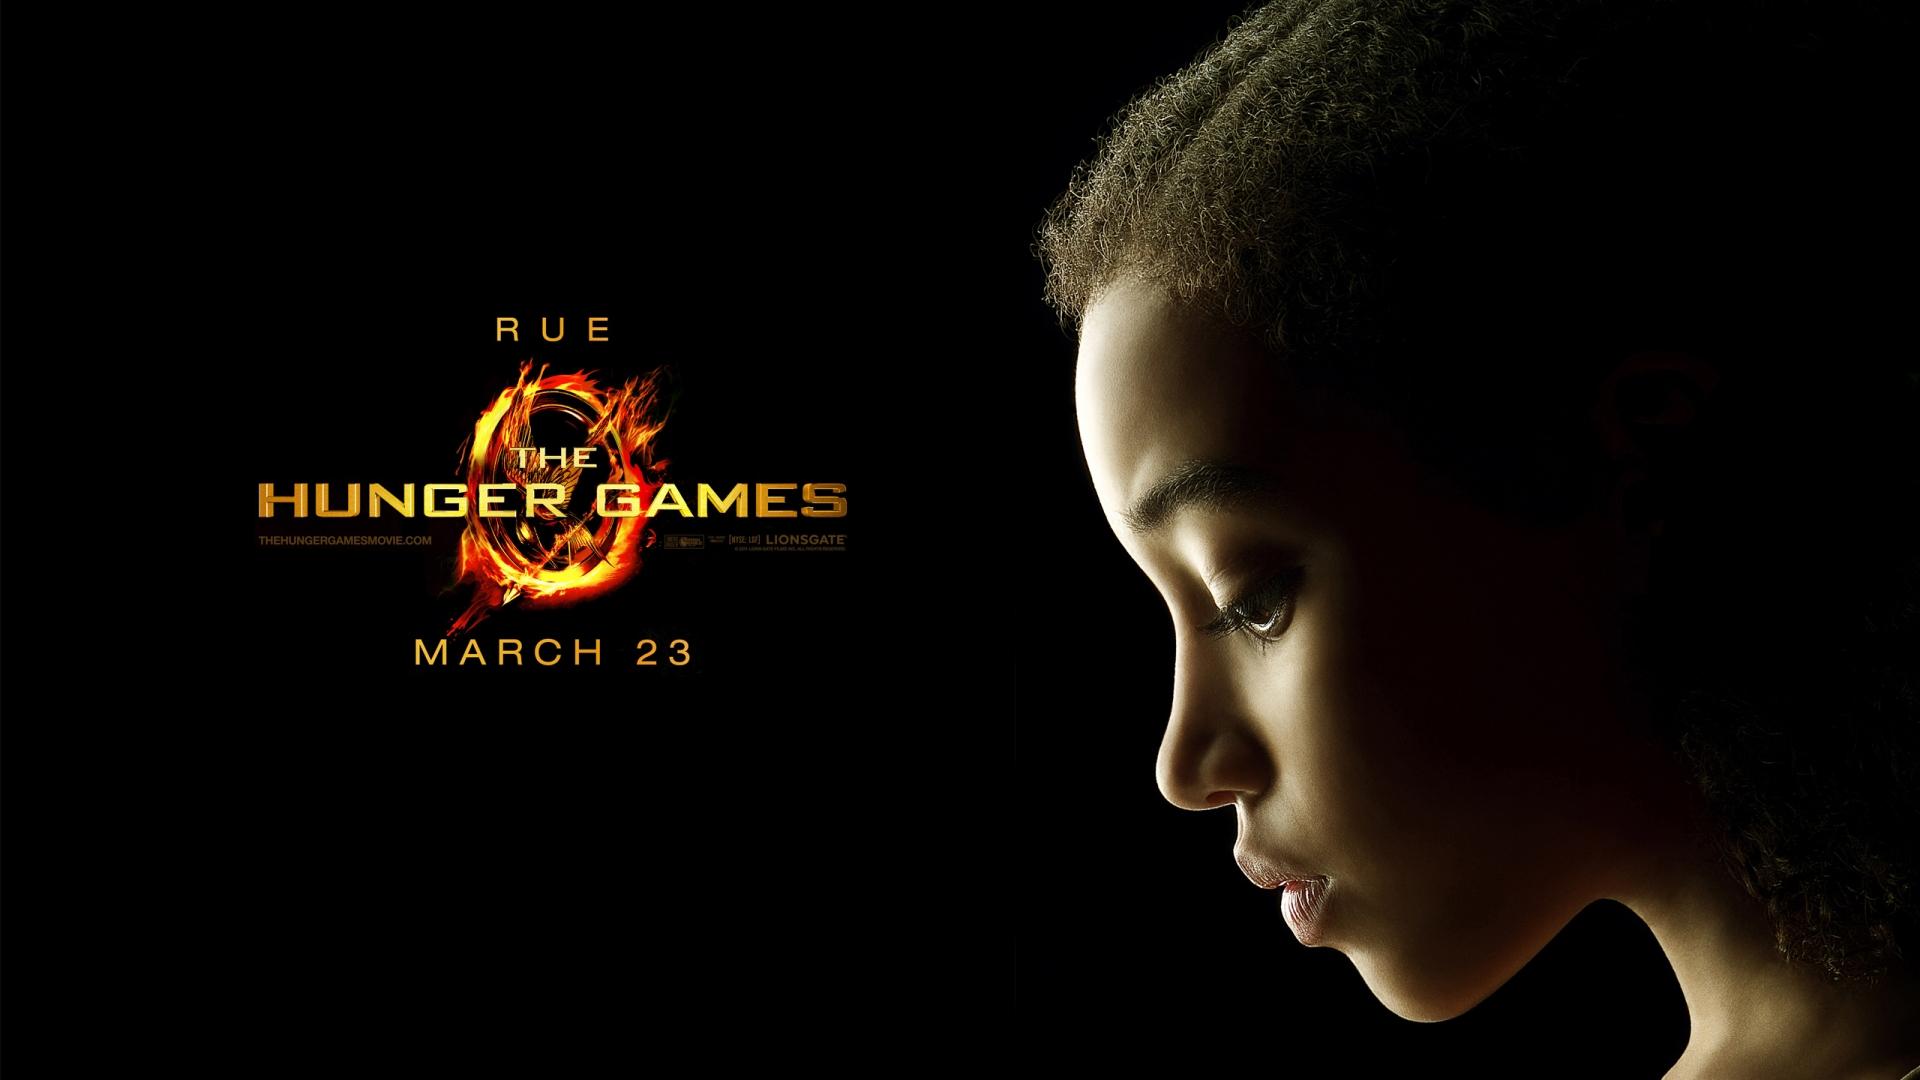 Hunger Games Rue Amandla Wallpaper HD